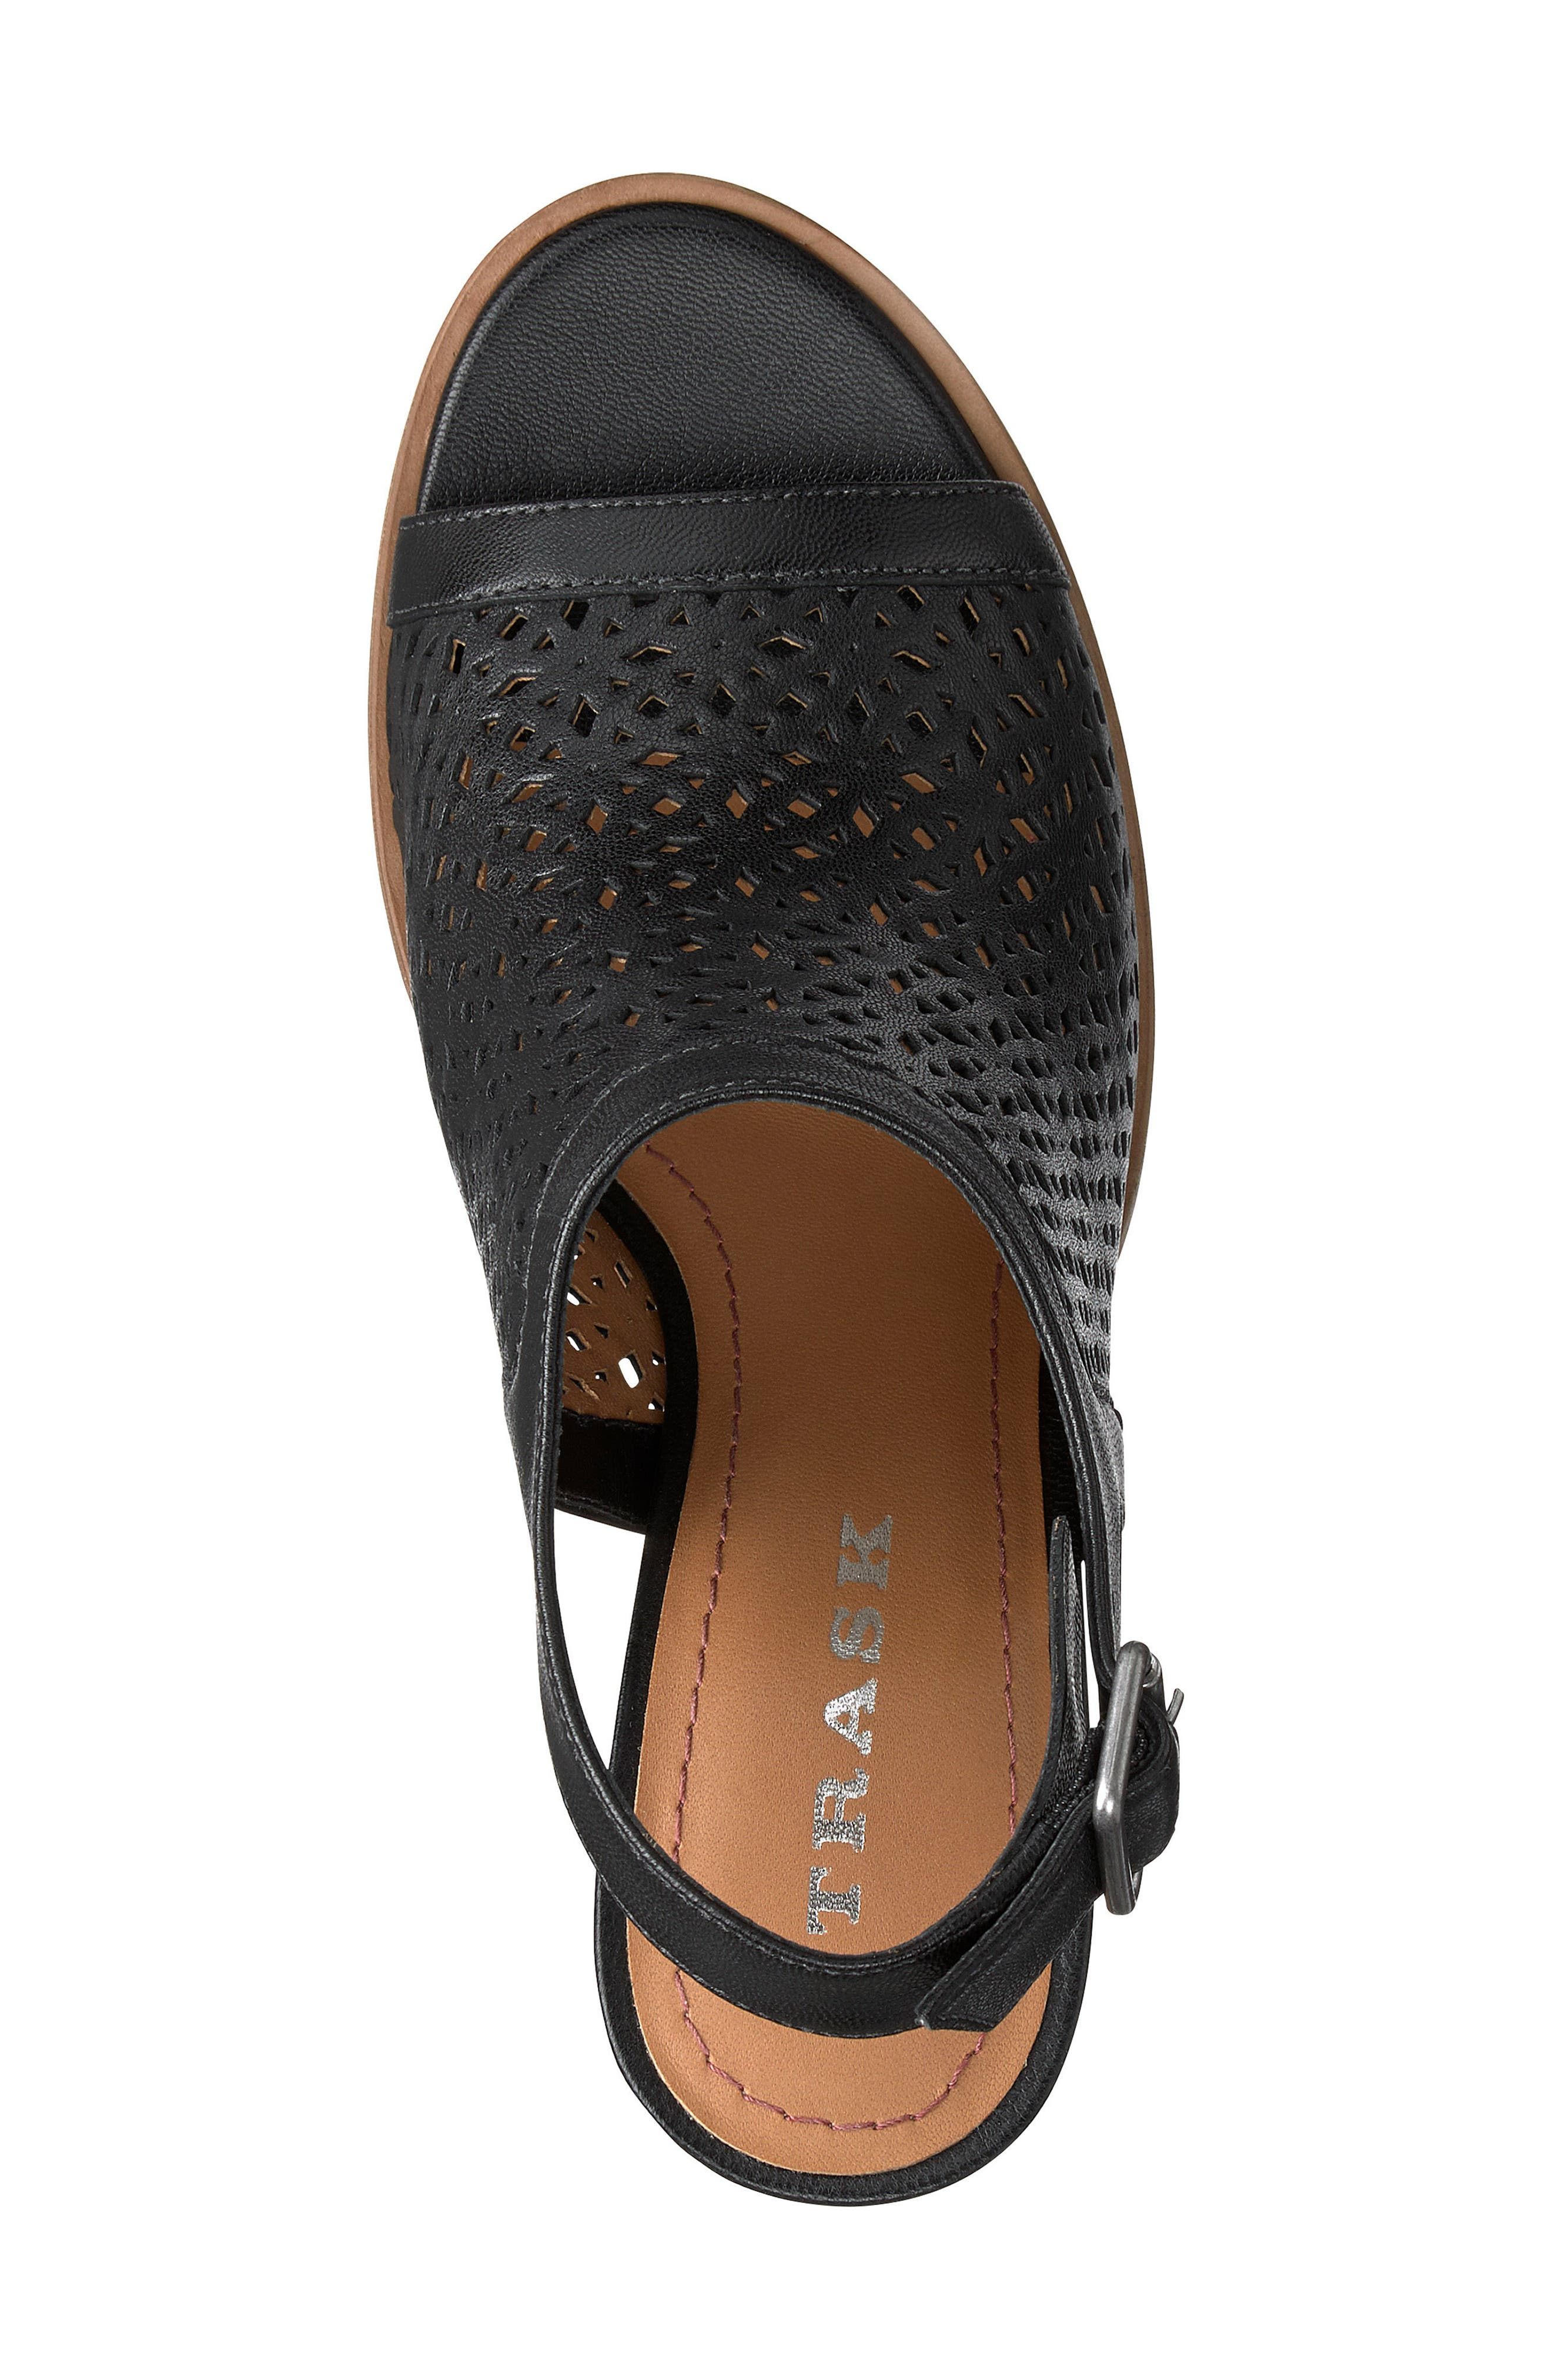 Parker Slingback Sandal,                             Alternate thumbnail 5, color,                             Black Leather